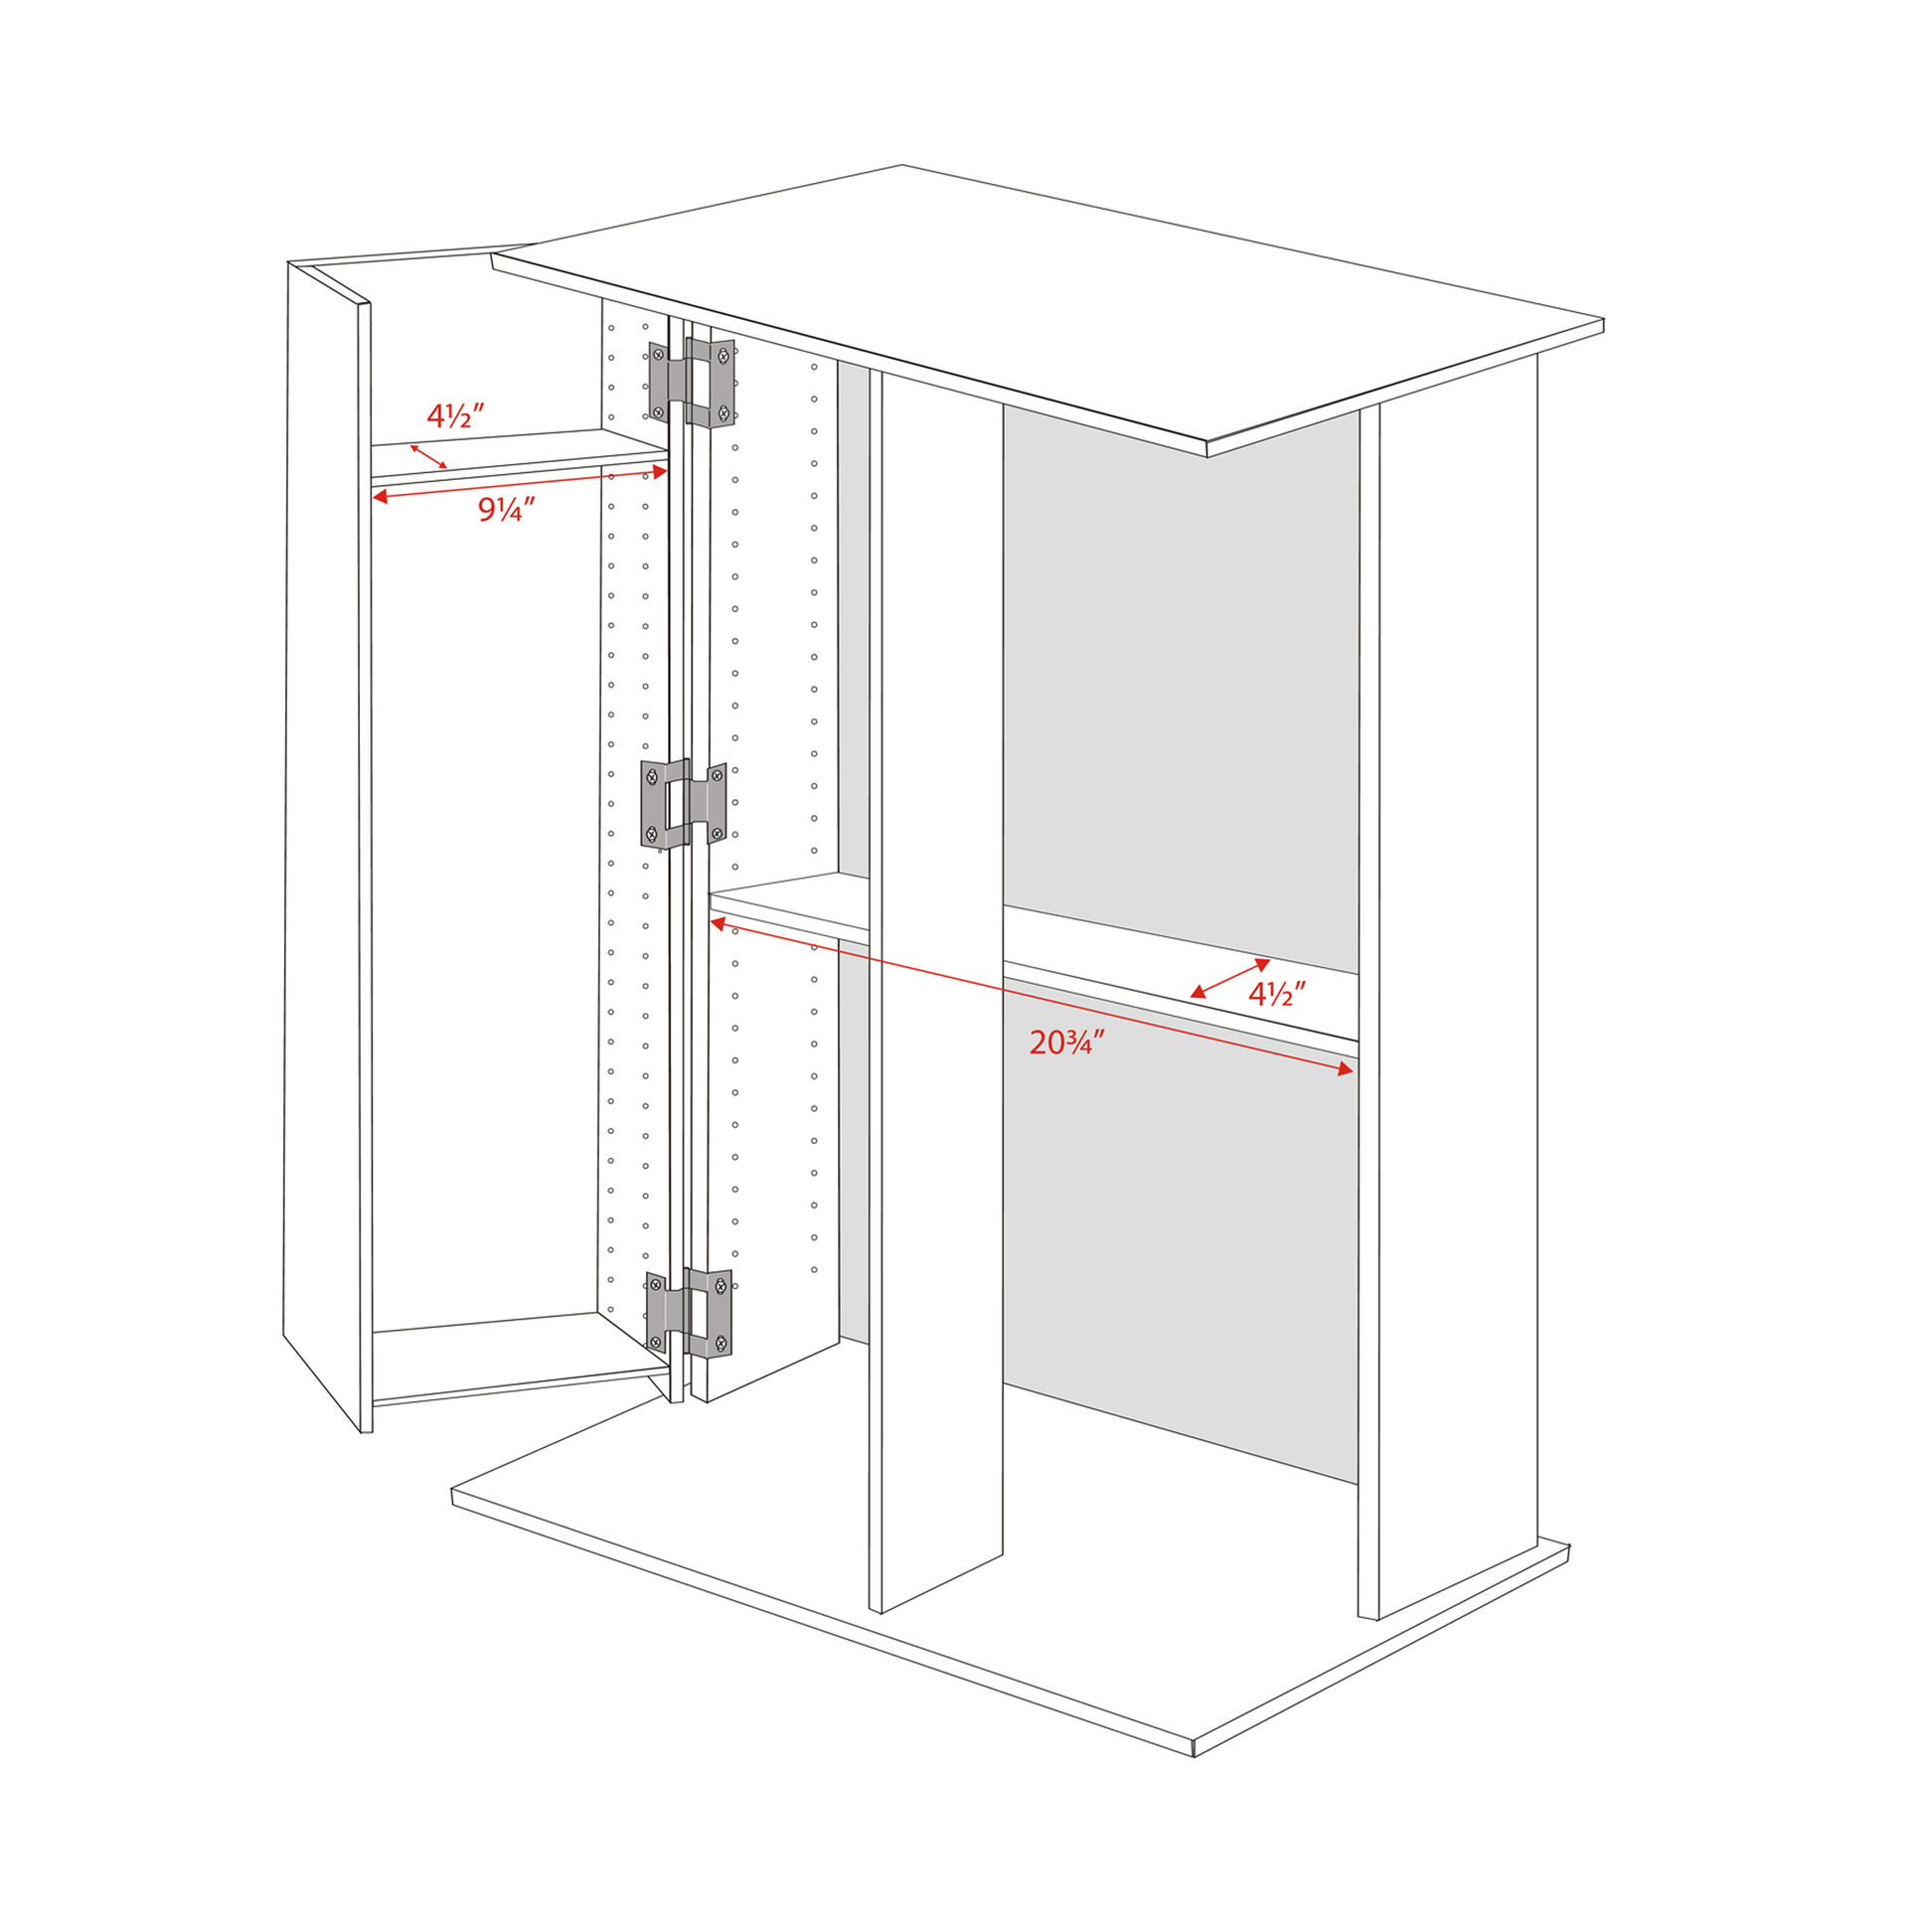 Astounding Tall Locking Media Storage Cabinet By Prepac Download Free Architecture Designs Scobabritishbridgeorg